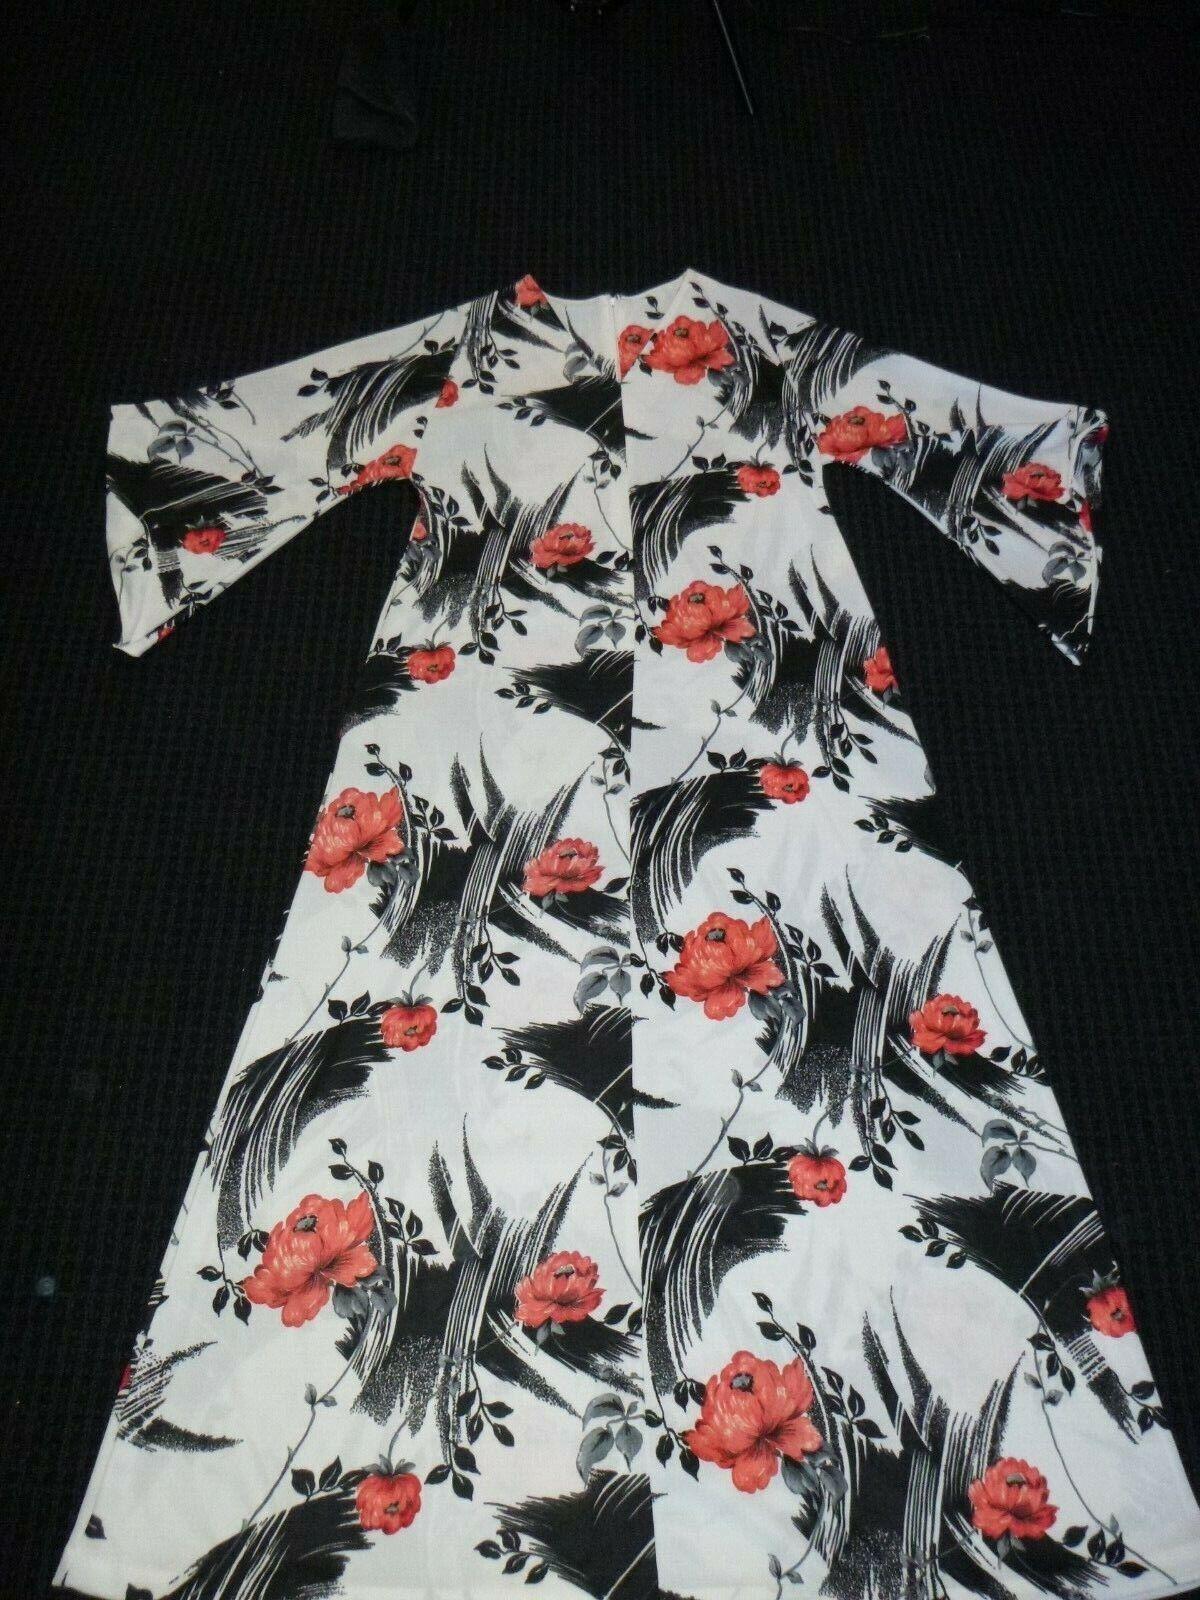 NOS Vtg 70s Beeline Fashions Polyester Maxi Dress MuuMuu White Red Floral Sz L